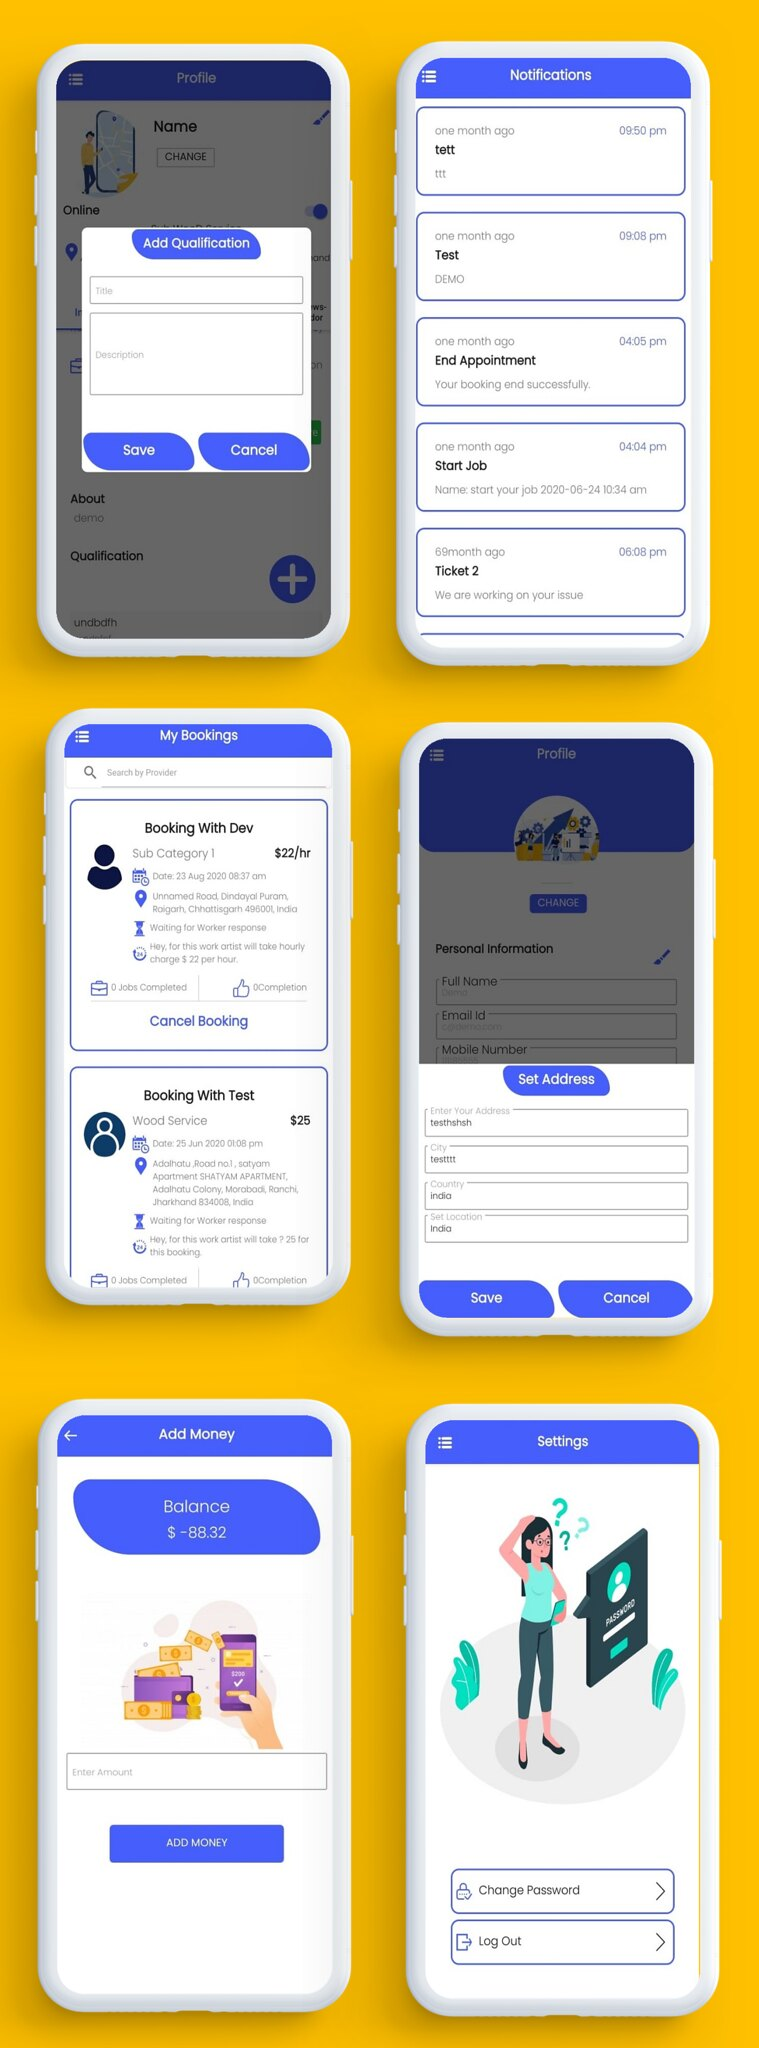 U Clab Service App | Service At Home | Multi Payment Gateways Integrated | Multi Login - 4